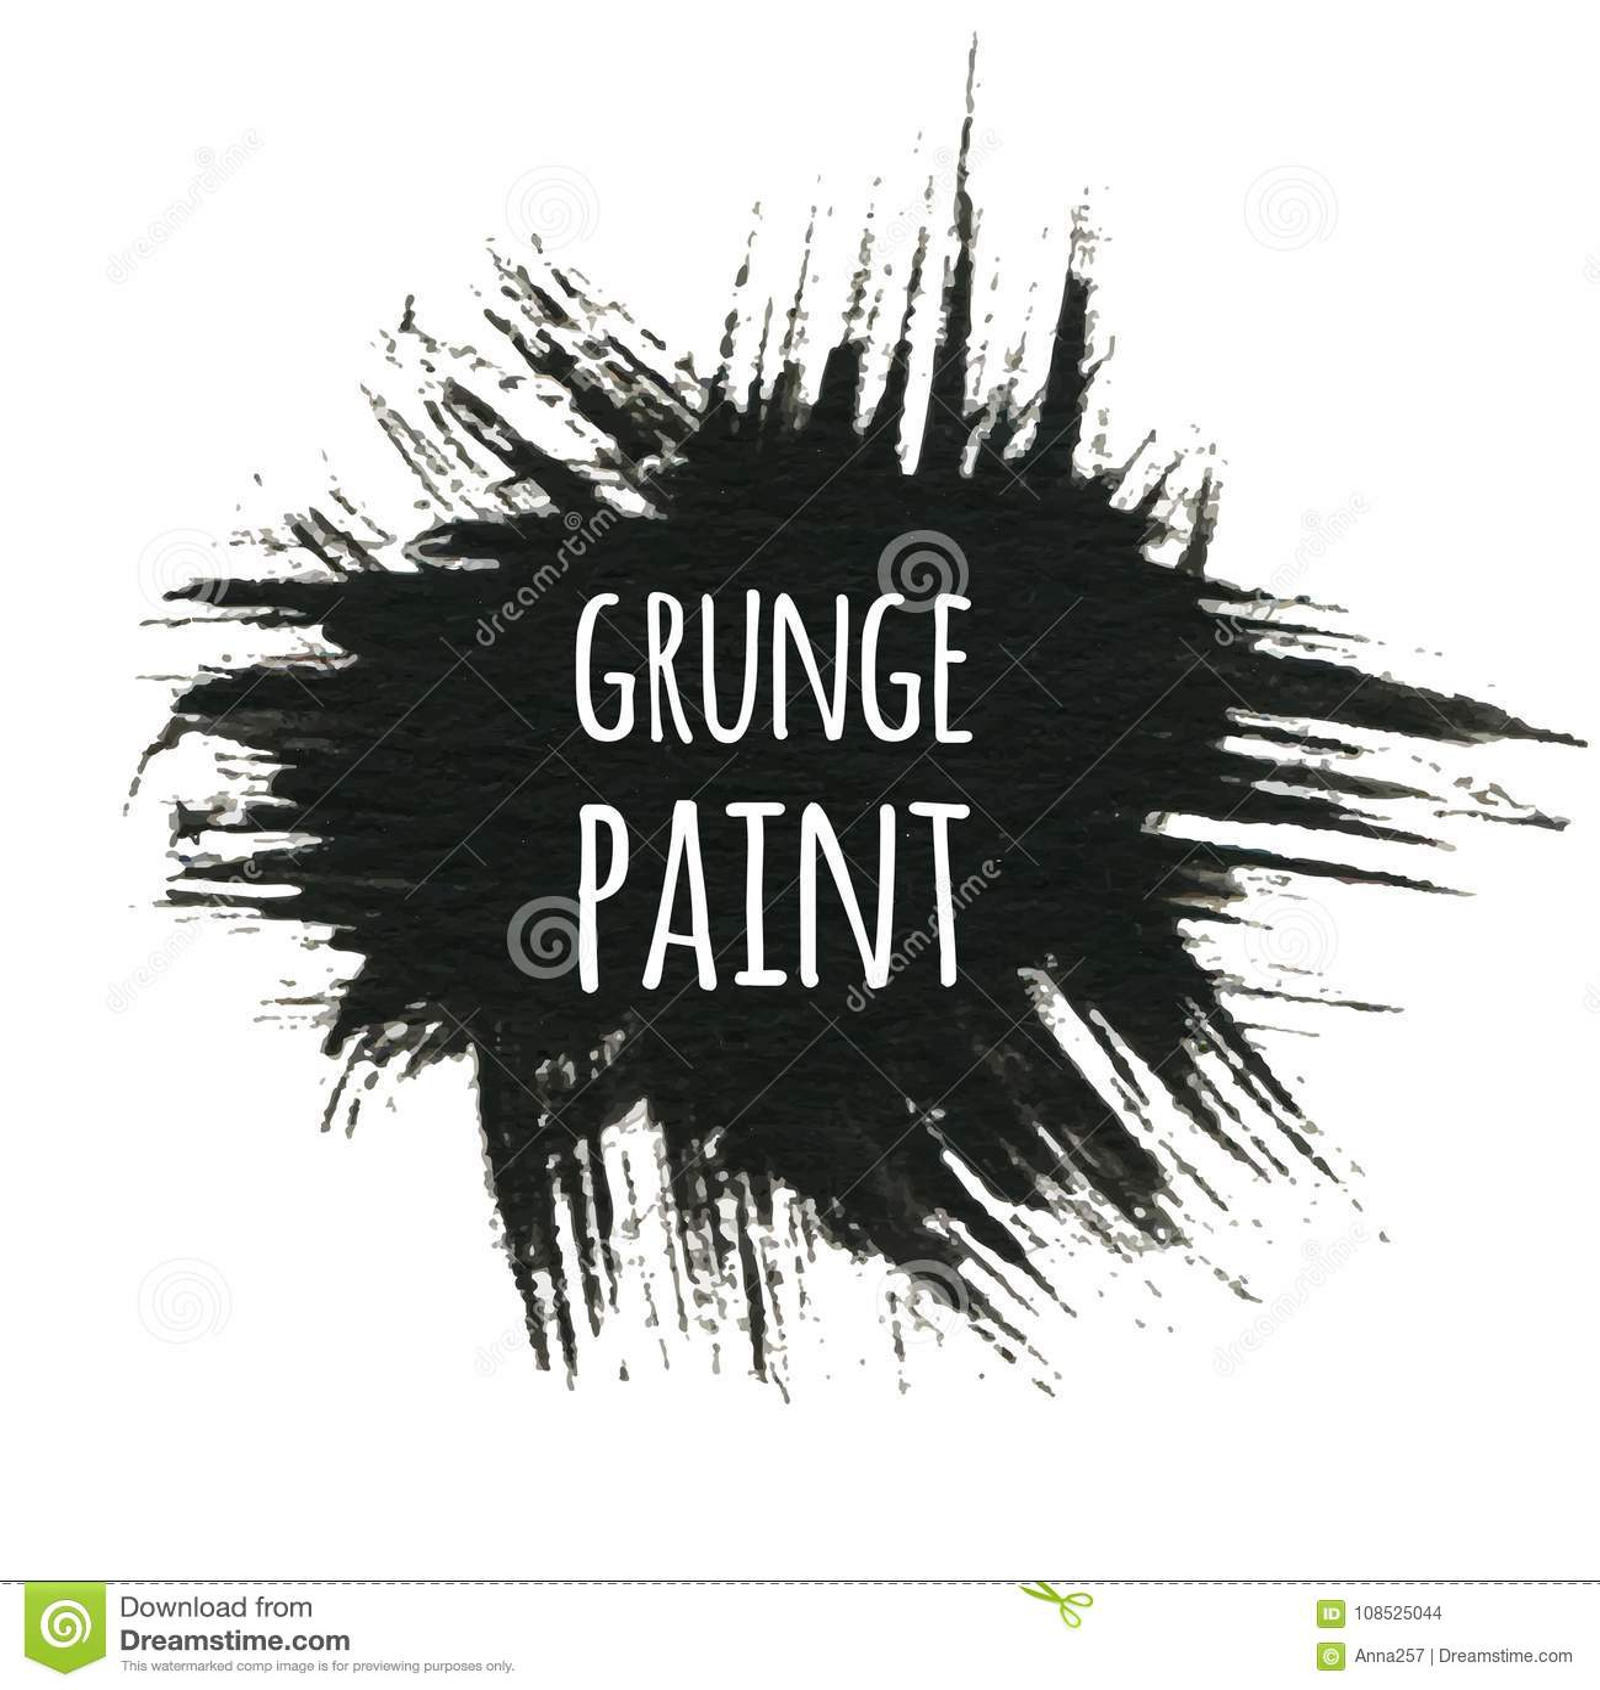 Grunge paint background, vector illustration for your design